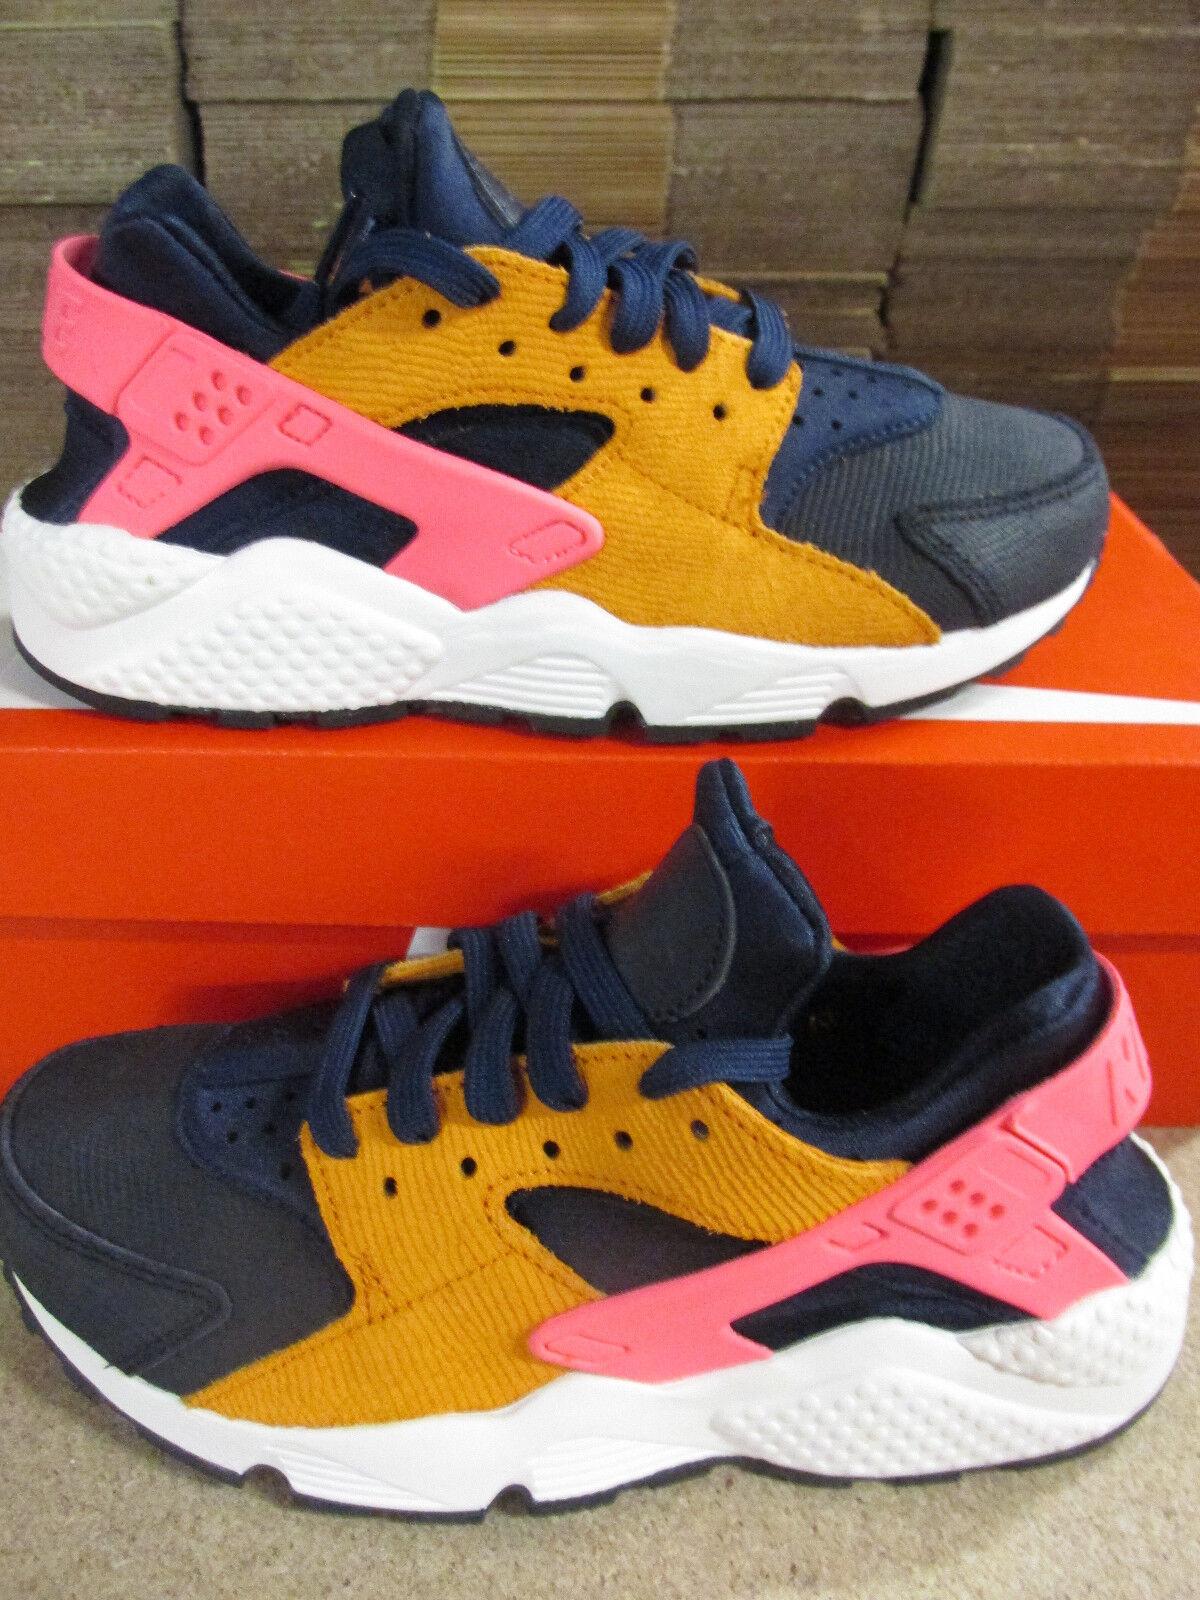 Nike Femmes Air Huarache Série Prm Baskets 683818 401 Baskets